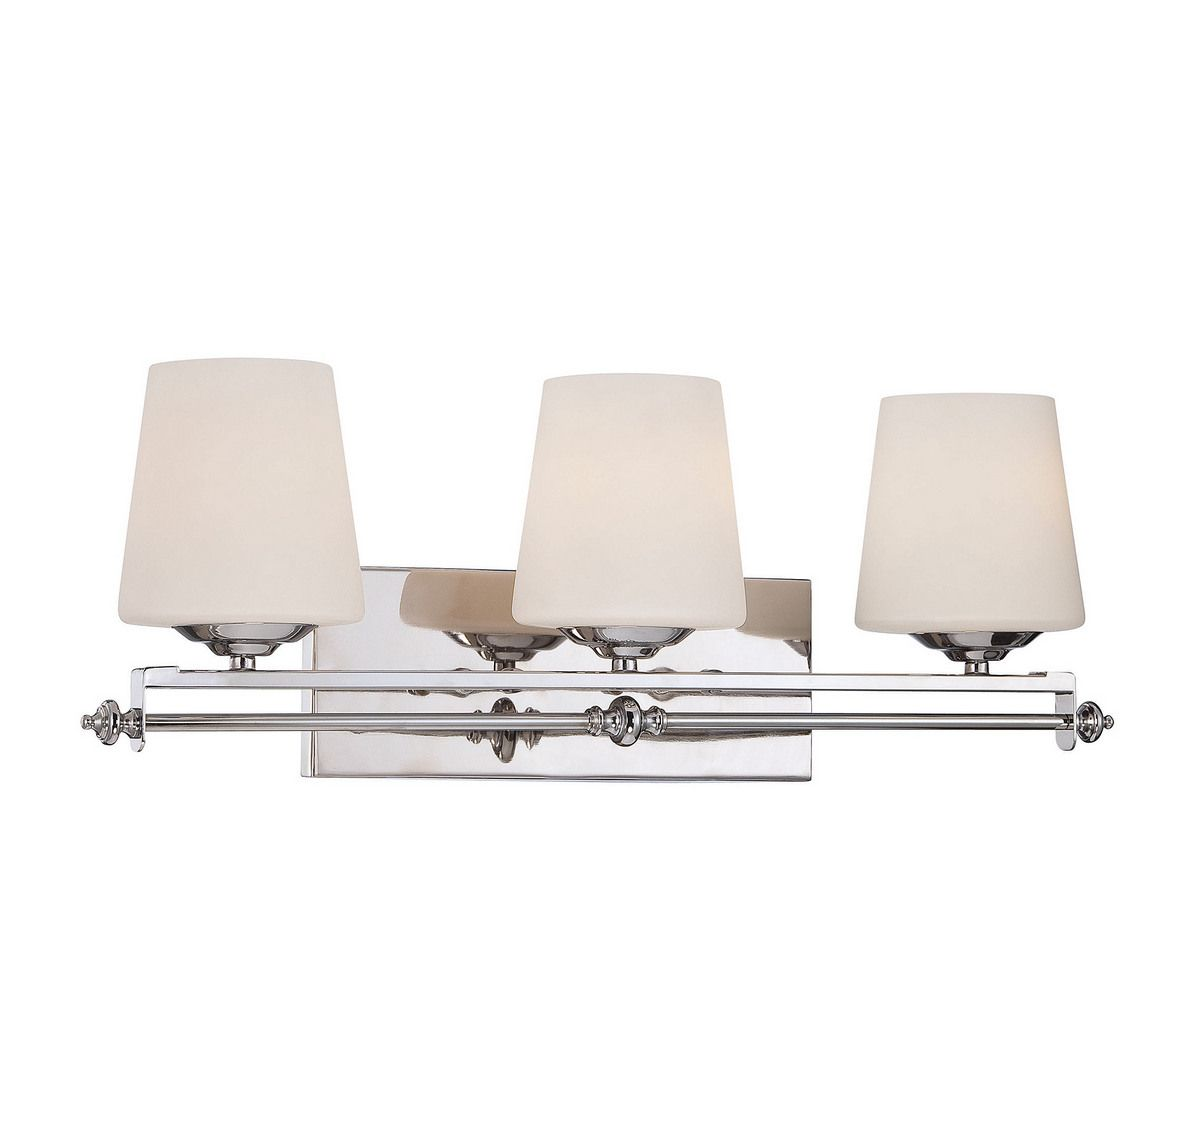 3 light vanity bar farmhouse style savoy house aiden 3light vanity bar in polished chrome bath lights